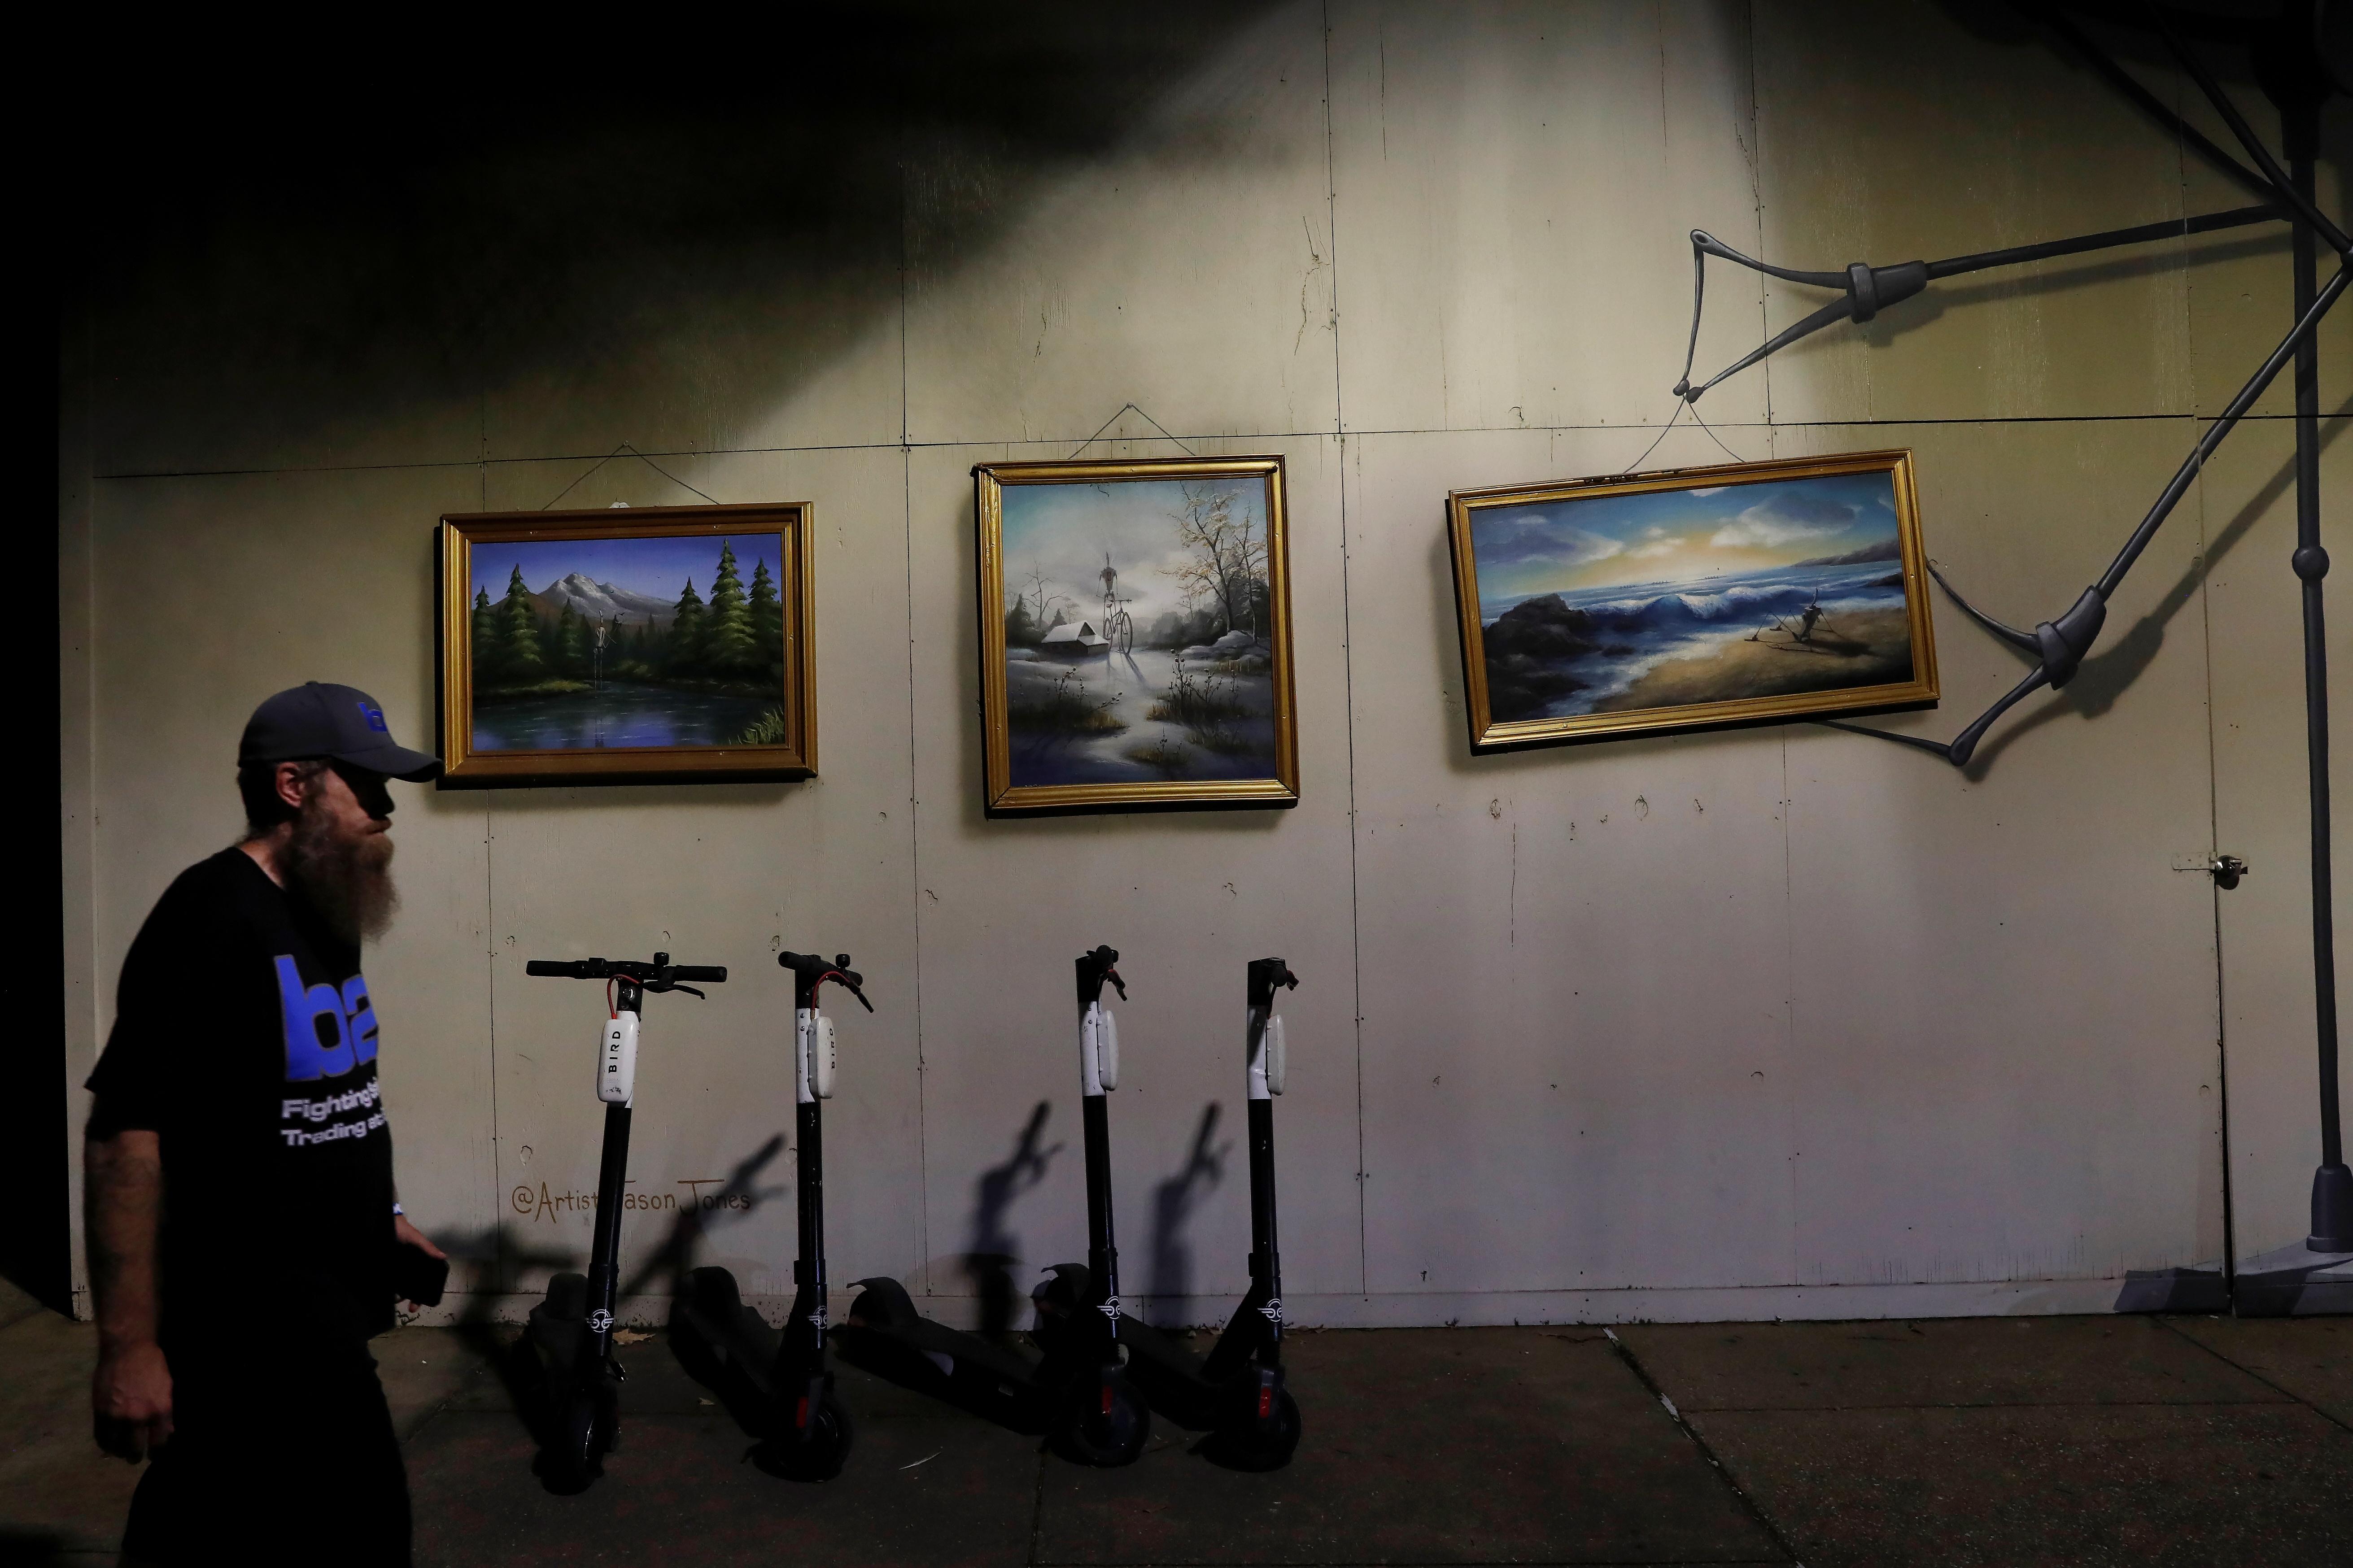 A man walks past hanging paintings, amid the coronavirus disease (COVID-19) pandemic, along Main Street in Little Rock, Arkansas, U.S., August 13, 2021. REUTERS/Shannon Stapleton